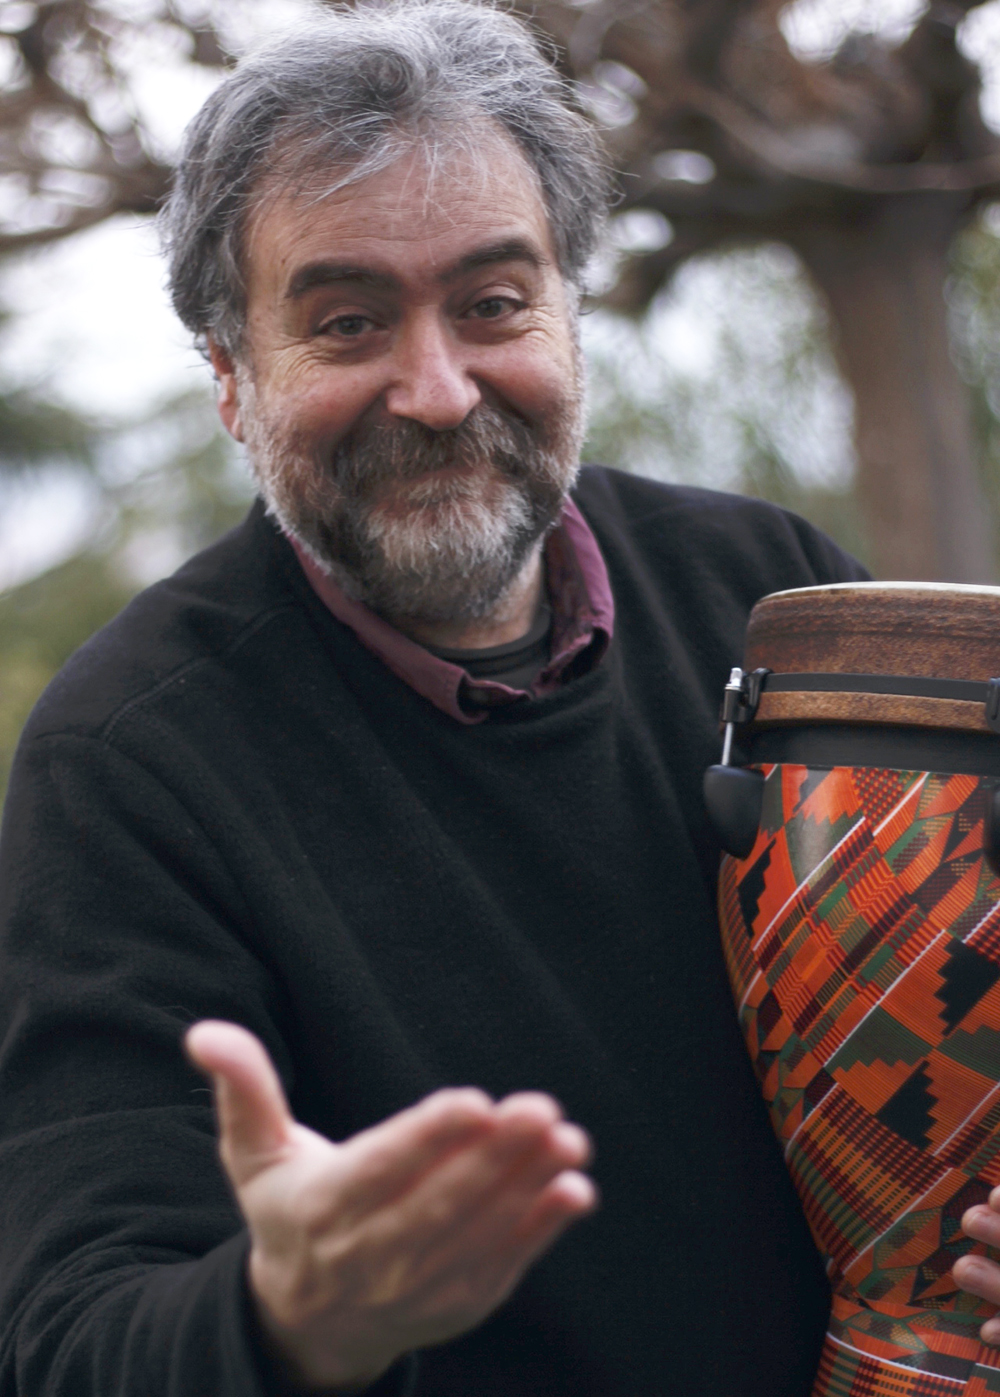 Pau Gimeno